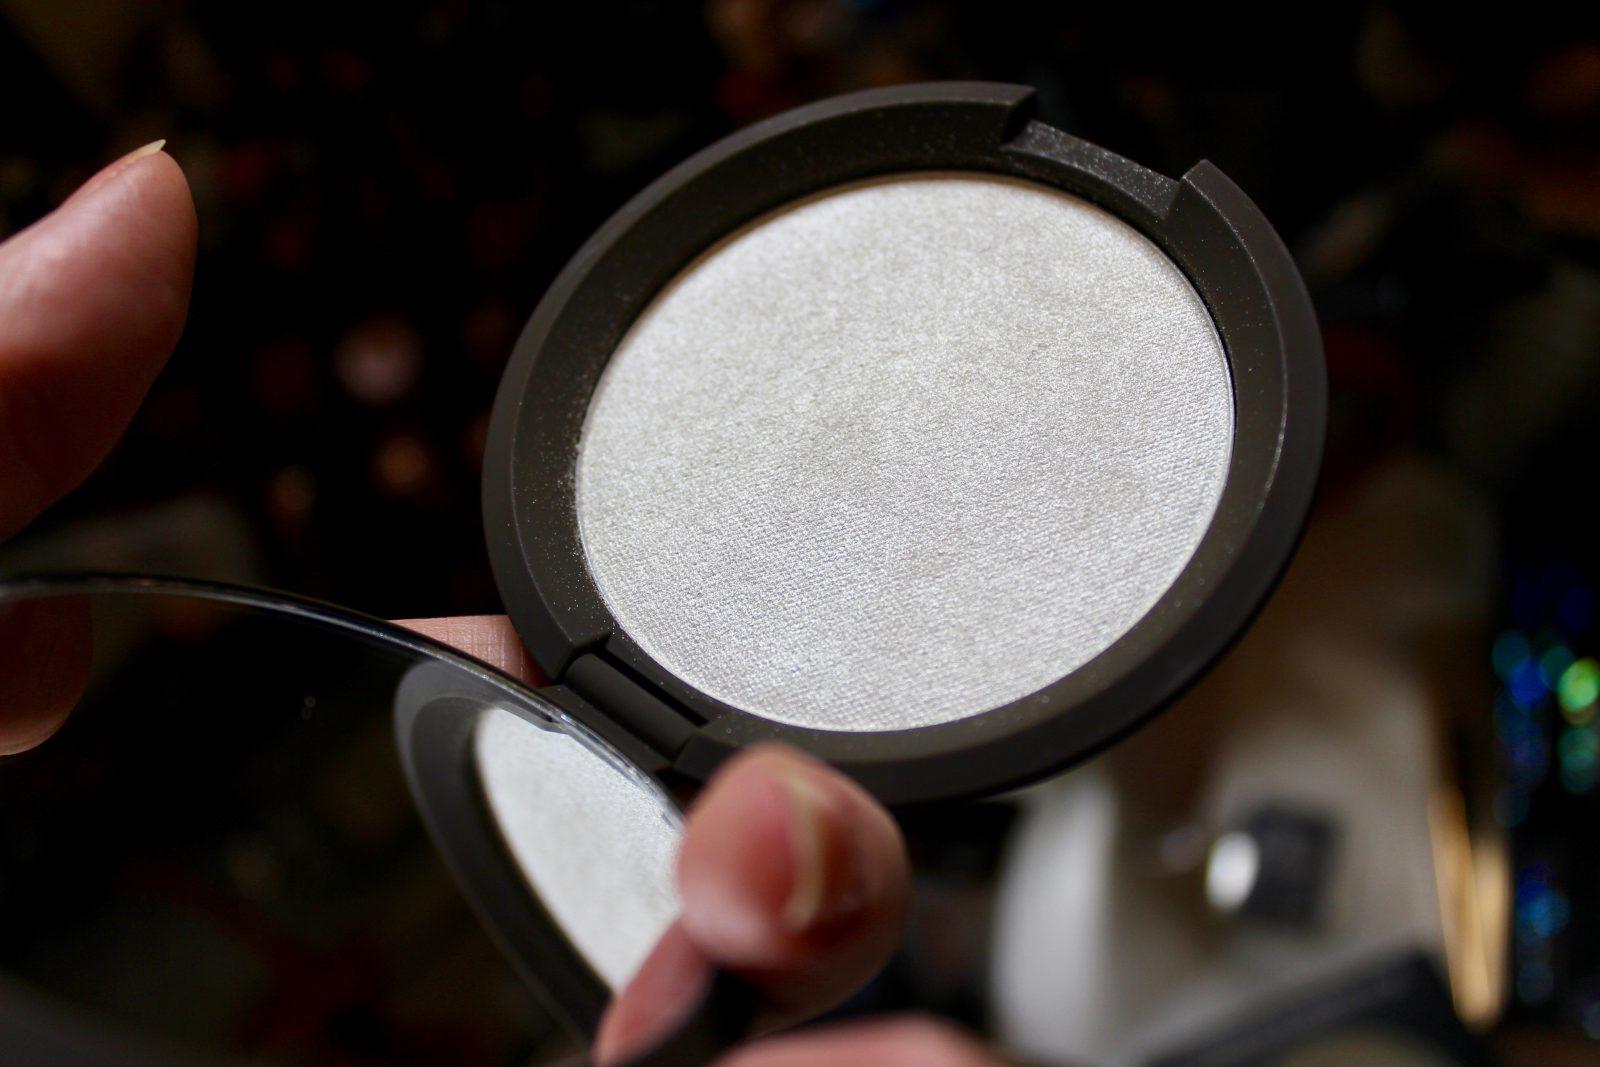 becca pearl highlighter